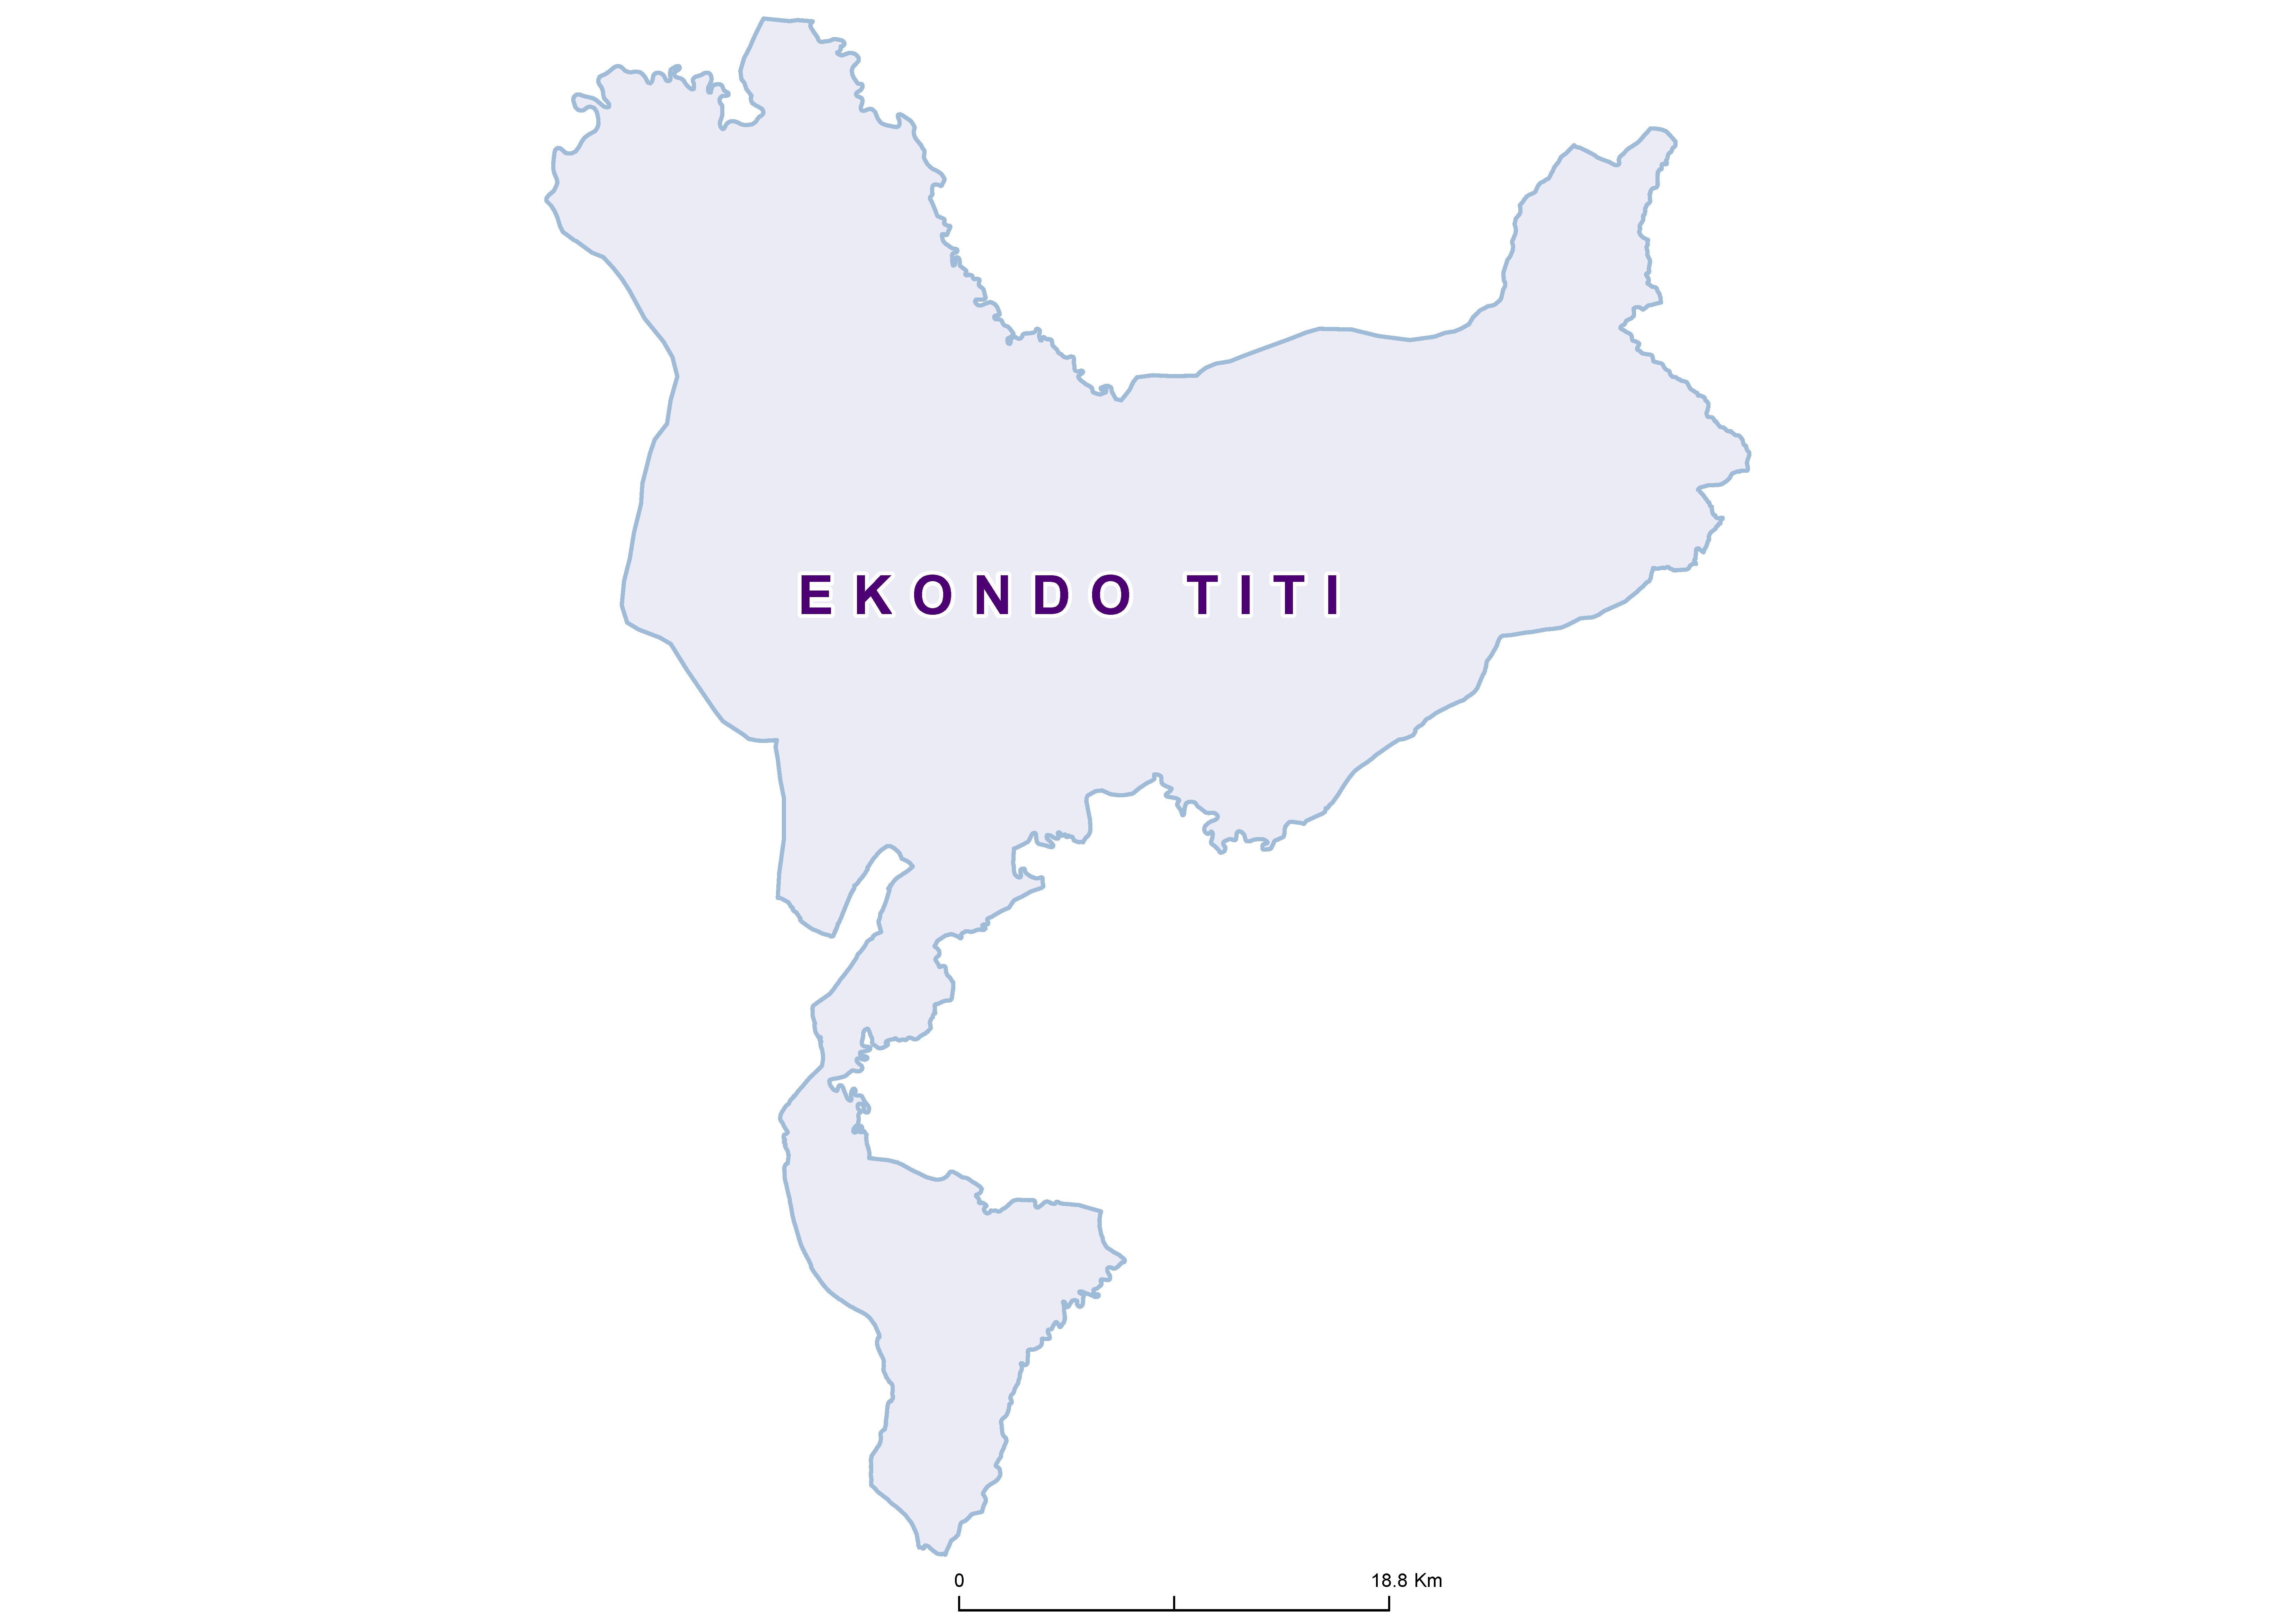 Ekondo titi Max STH 20180001